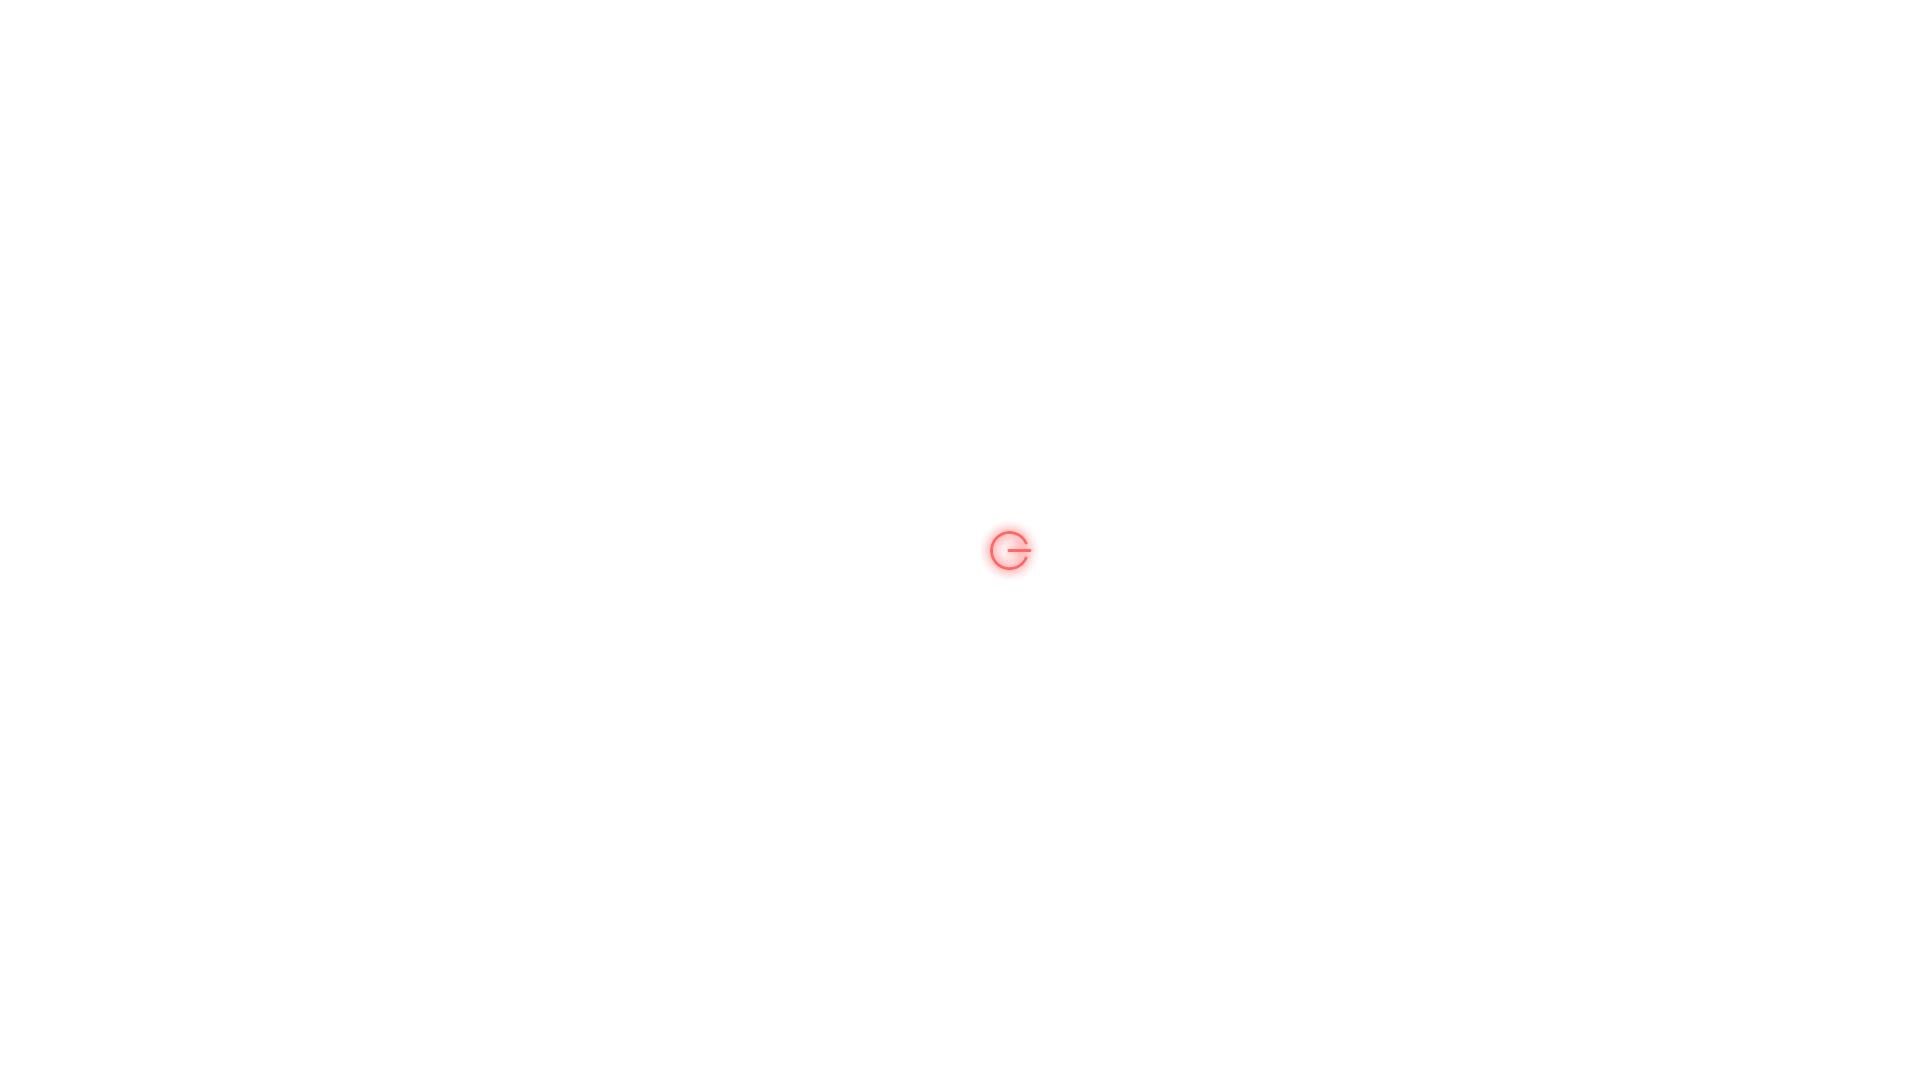 RE: Белый экран